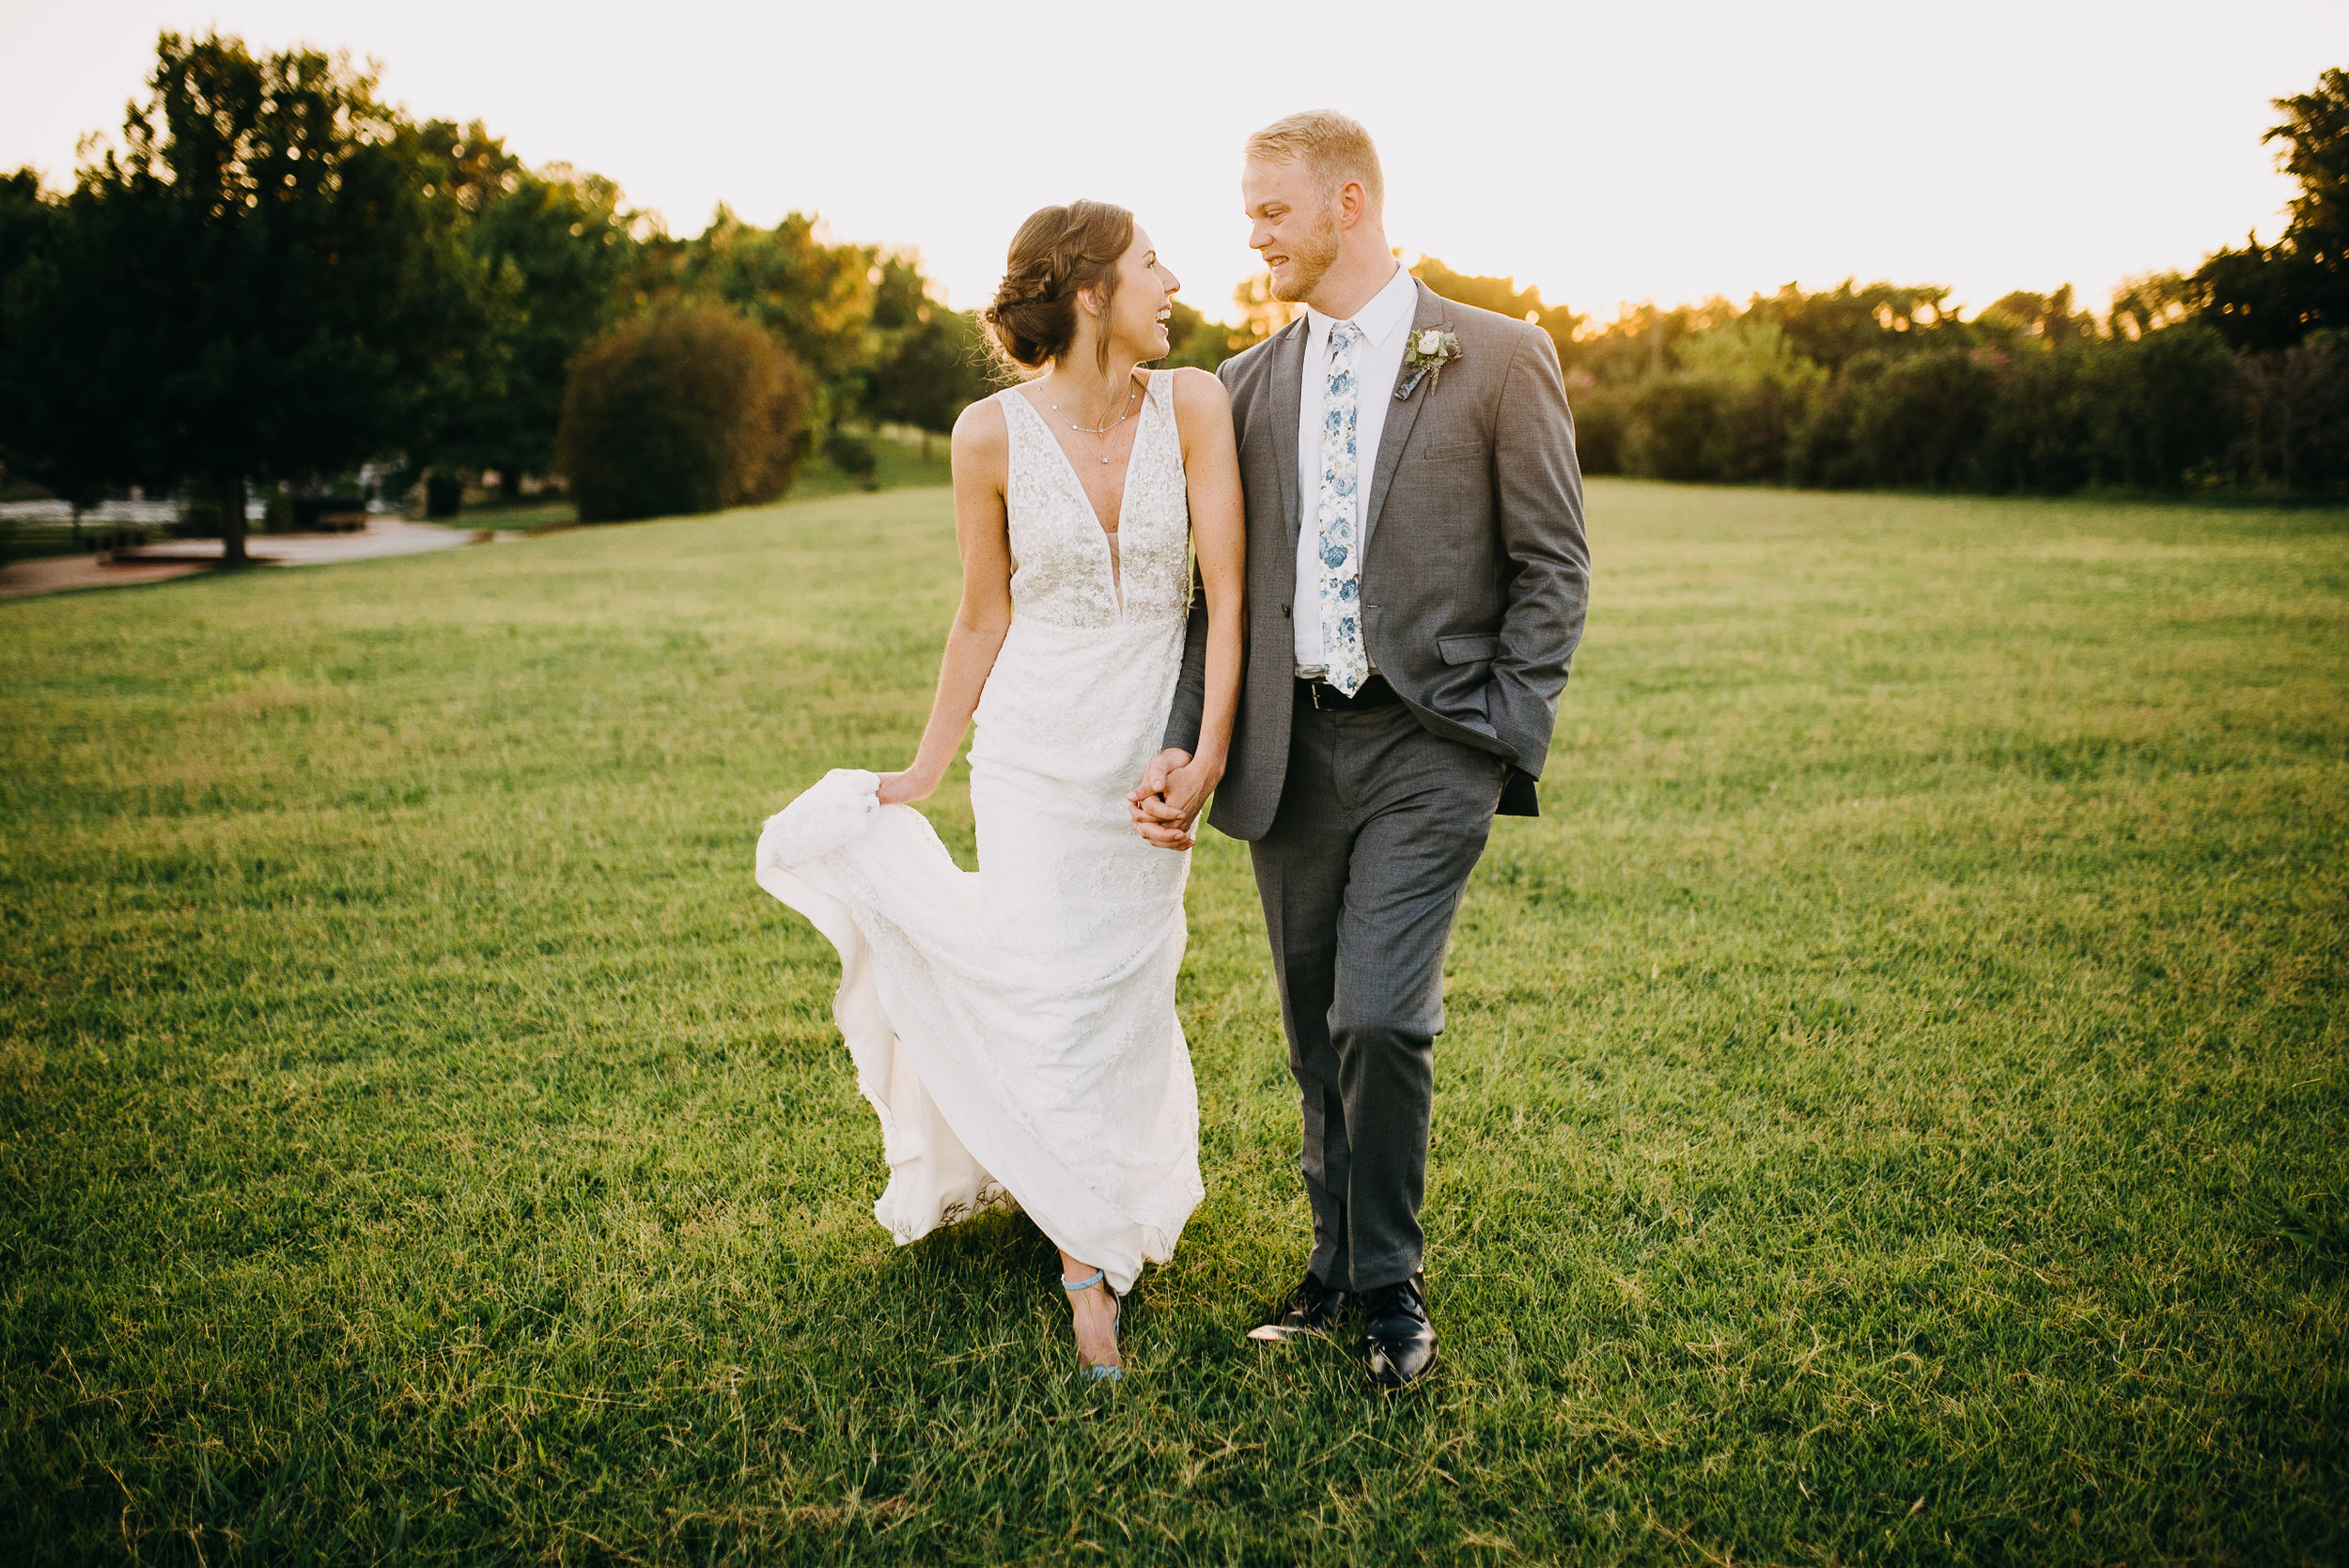 okc-wedding-photographer-coles-garden-wedding-okc-best-wedding-photographers-145.jpg